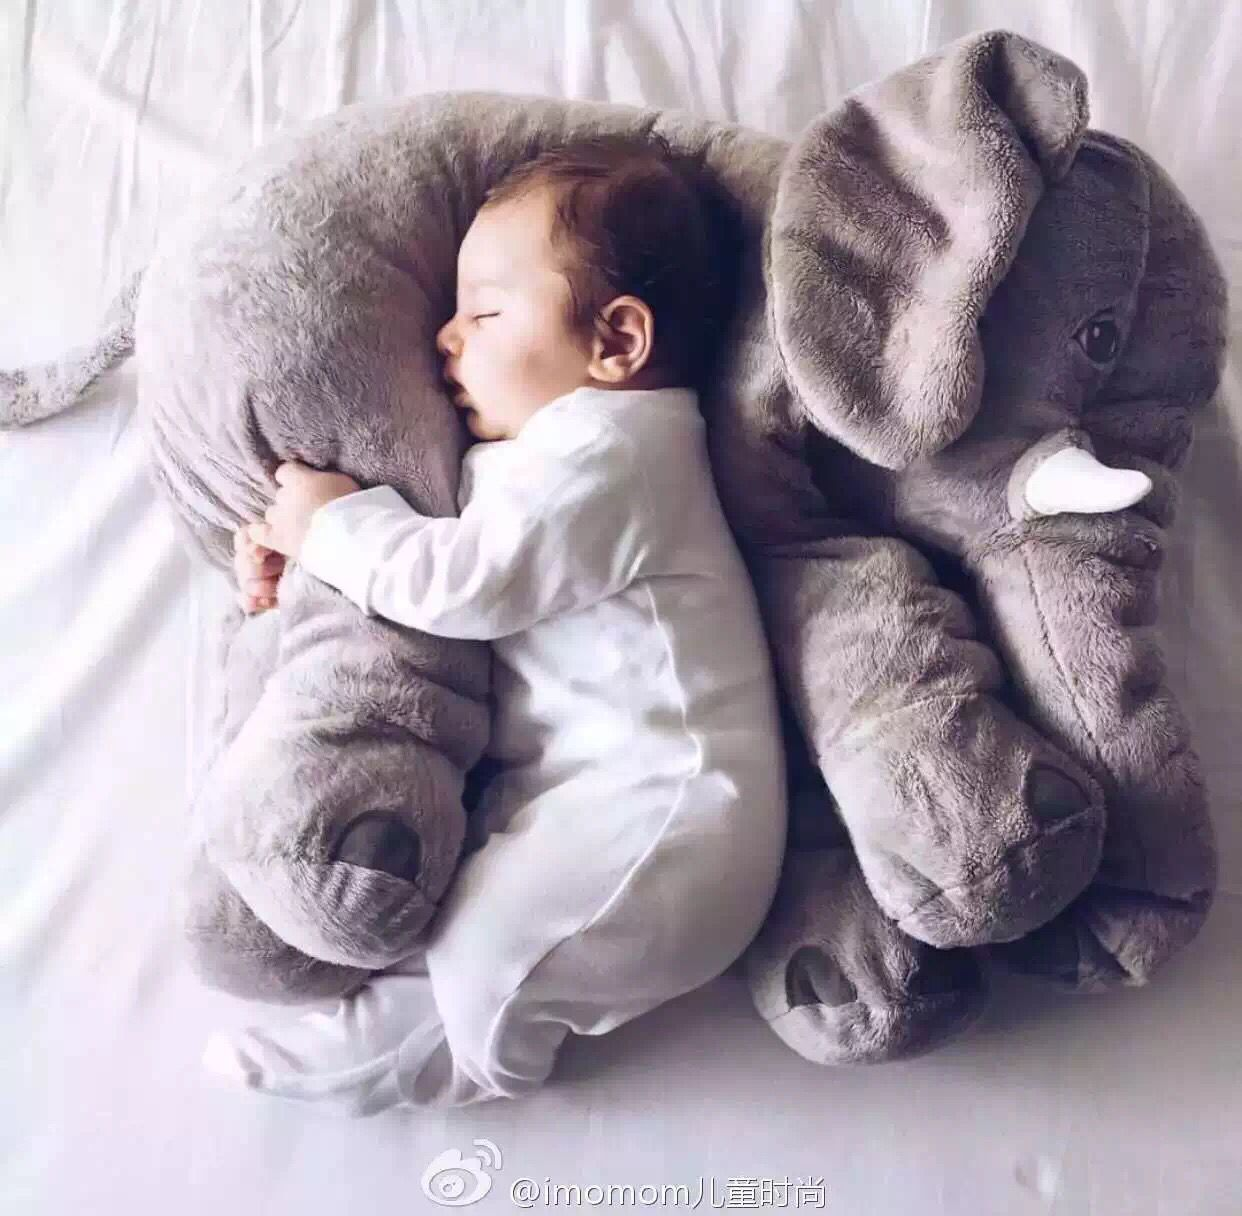 2016 Fashion Baby Animal Elephant Style Doll Stuffed Elephant Plush Dolls Pillow Kids Toy Children Room Bed Decoration Toys<br><br>Aliexpress